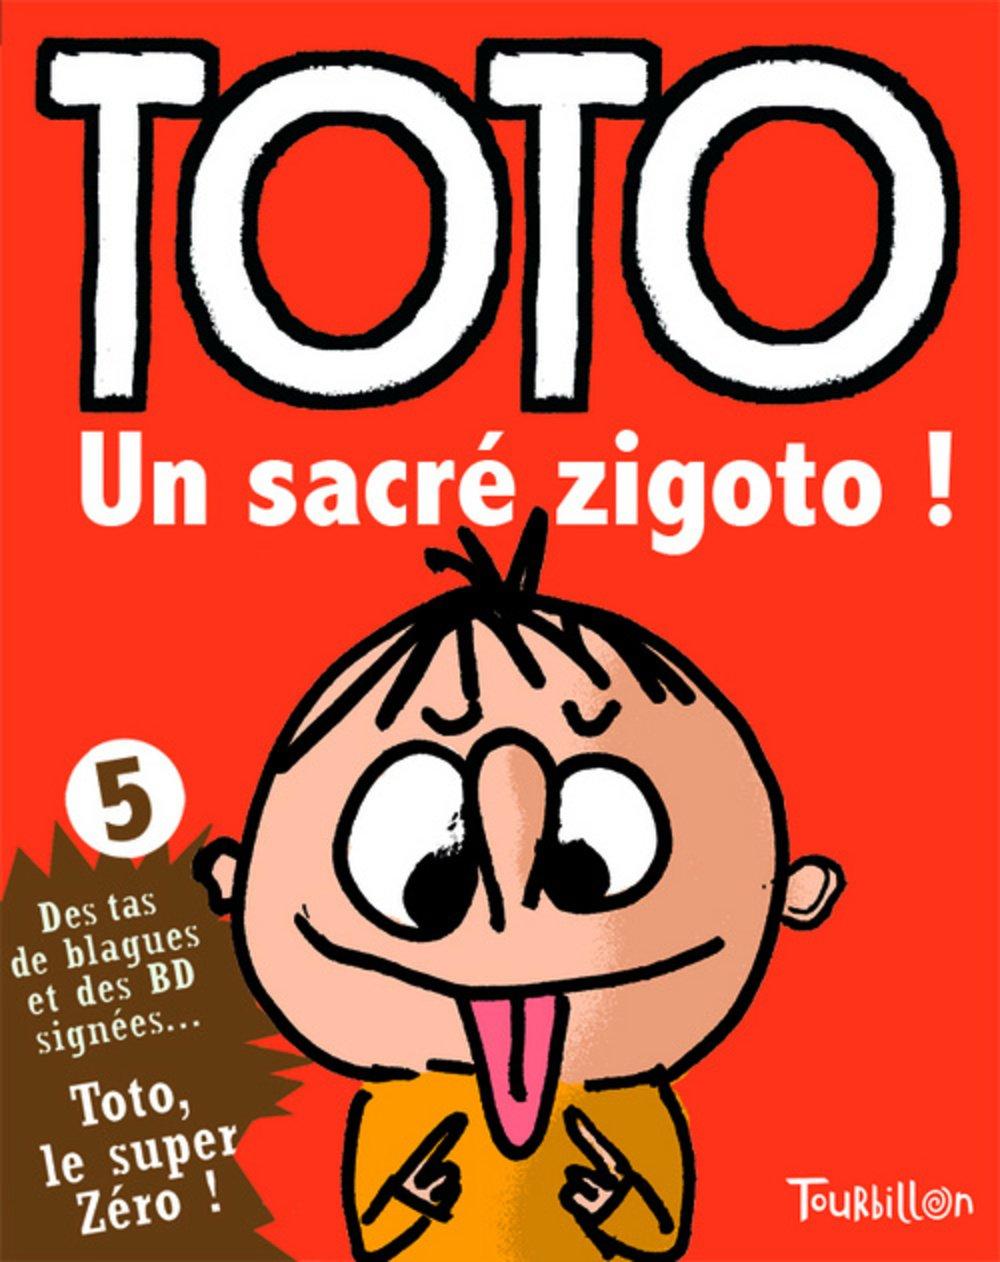 Toto, le super zéro !, Tome 5 : Un sacré zigoto ! (Anglais) Album – 2 juillet 2009 Serge Bloch Franck Girard Tourbillon 2848014660